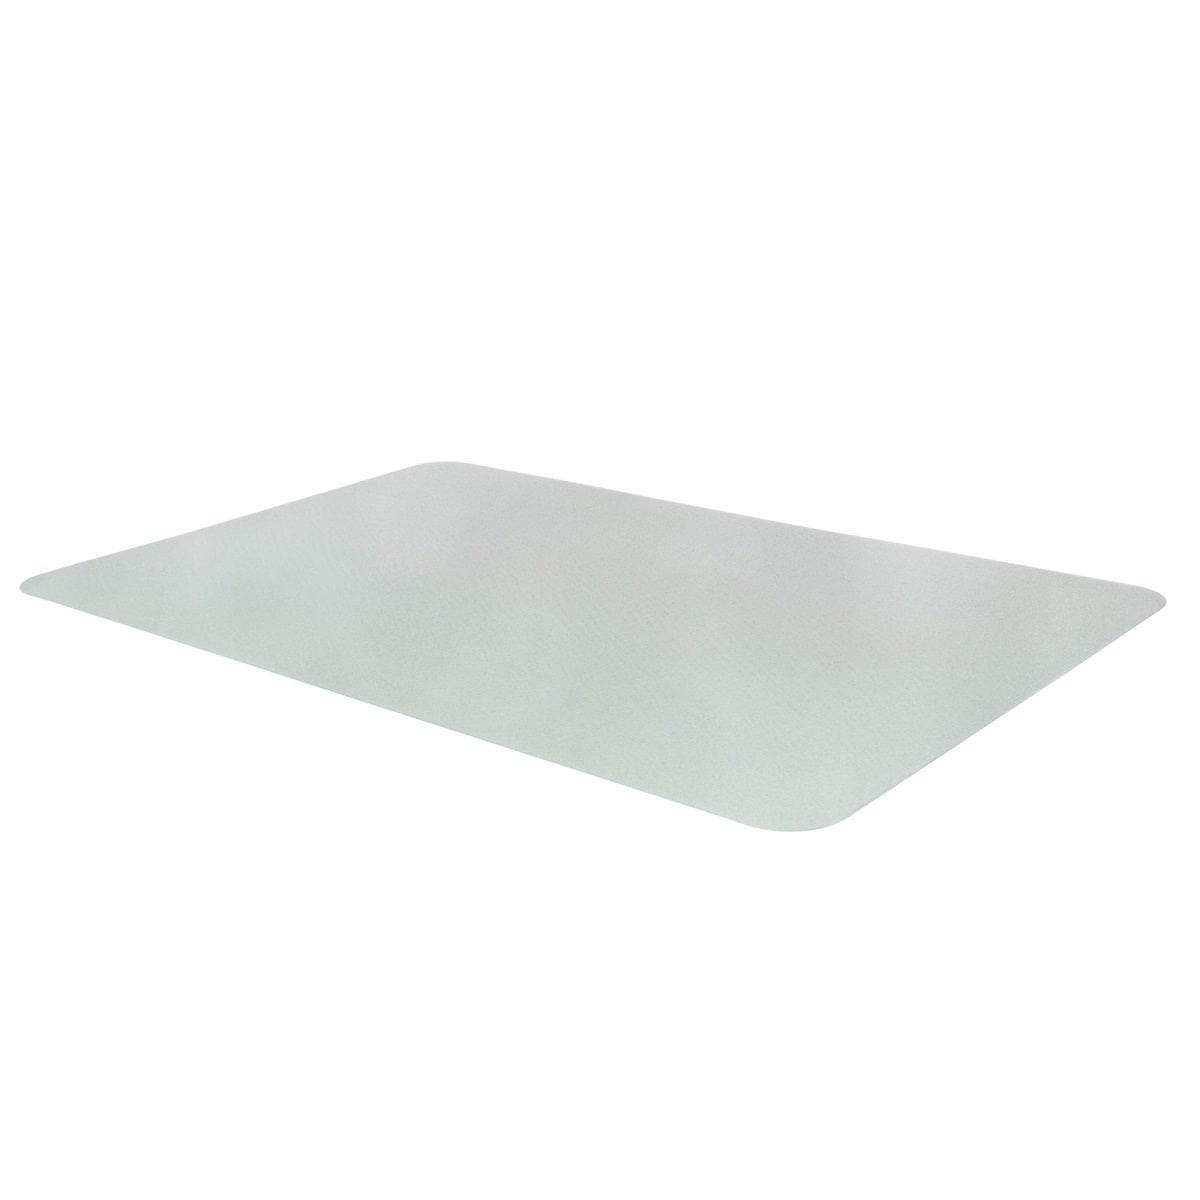 60 x 80 cm transparent Bodenschutzmatte